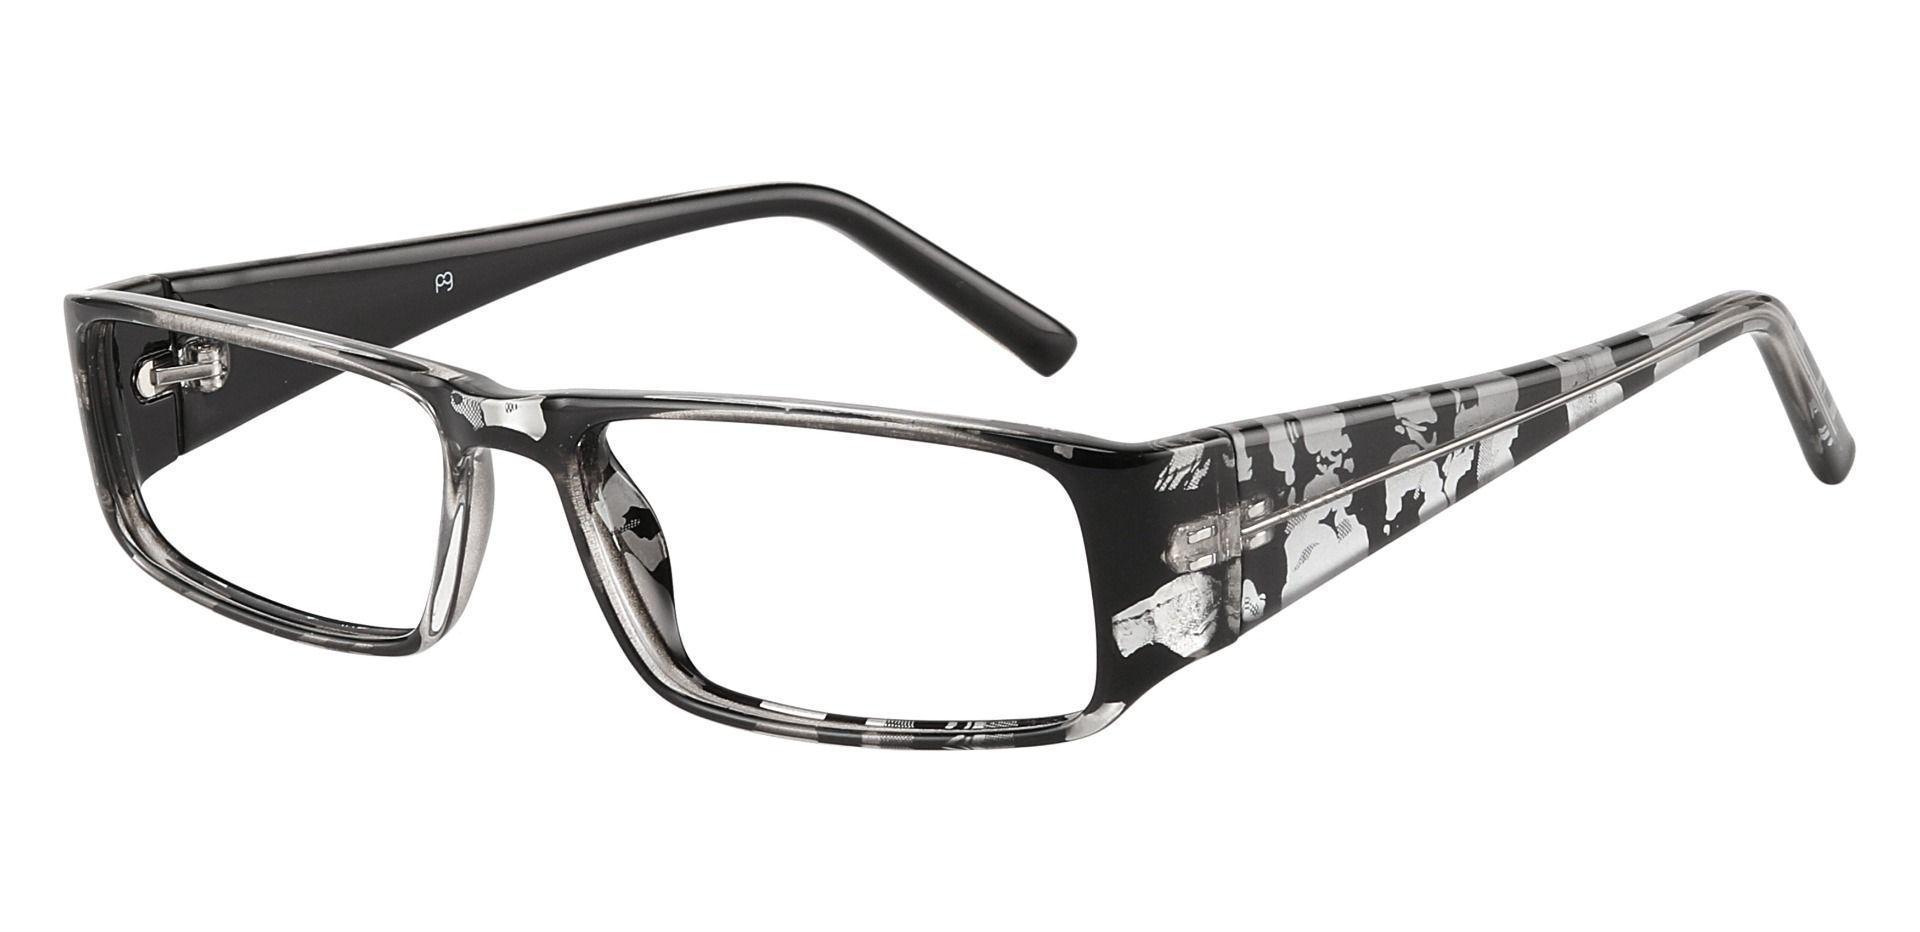 Elbert Rectangle Single Vision Glasses - Black